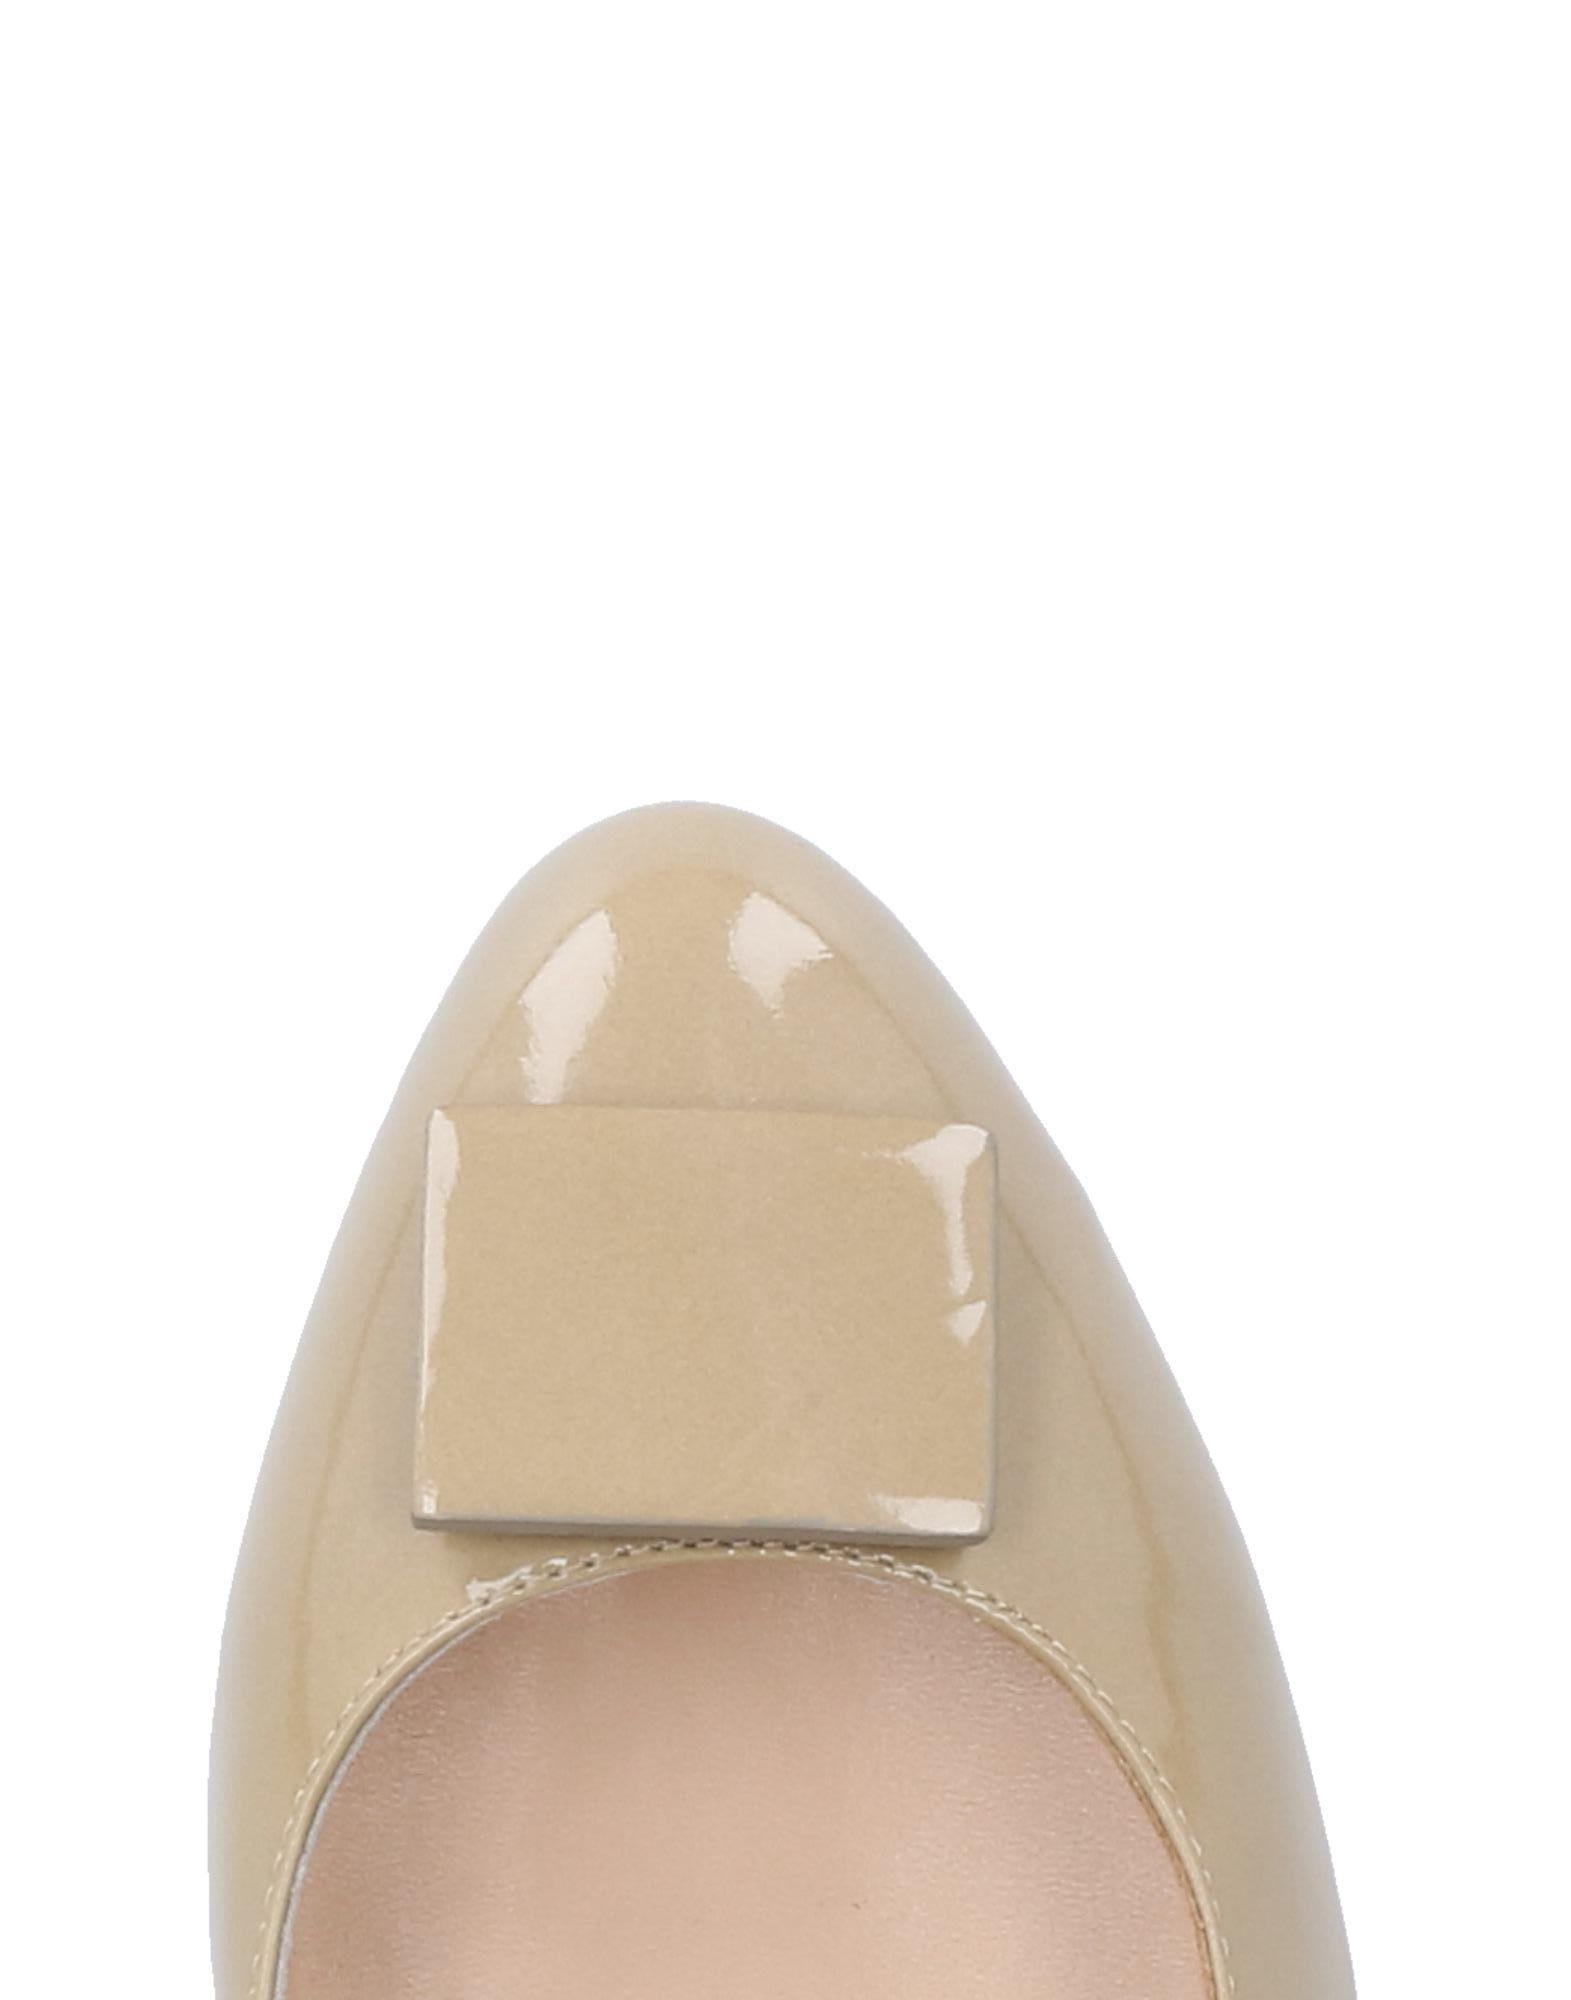 ... Mi Mai Gute Pumps Damen 11506057LE Gute Mi Mai Qualität beliebte Schuhe  4a88c5 3018e37ed4